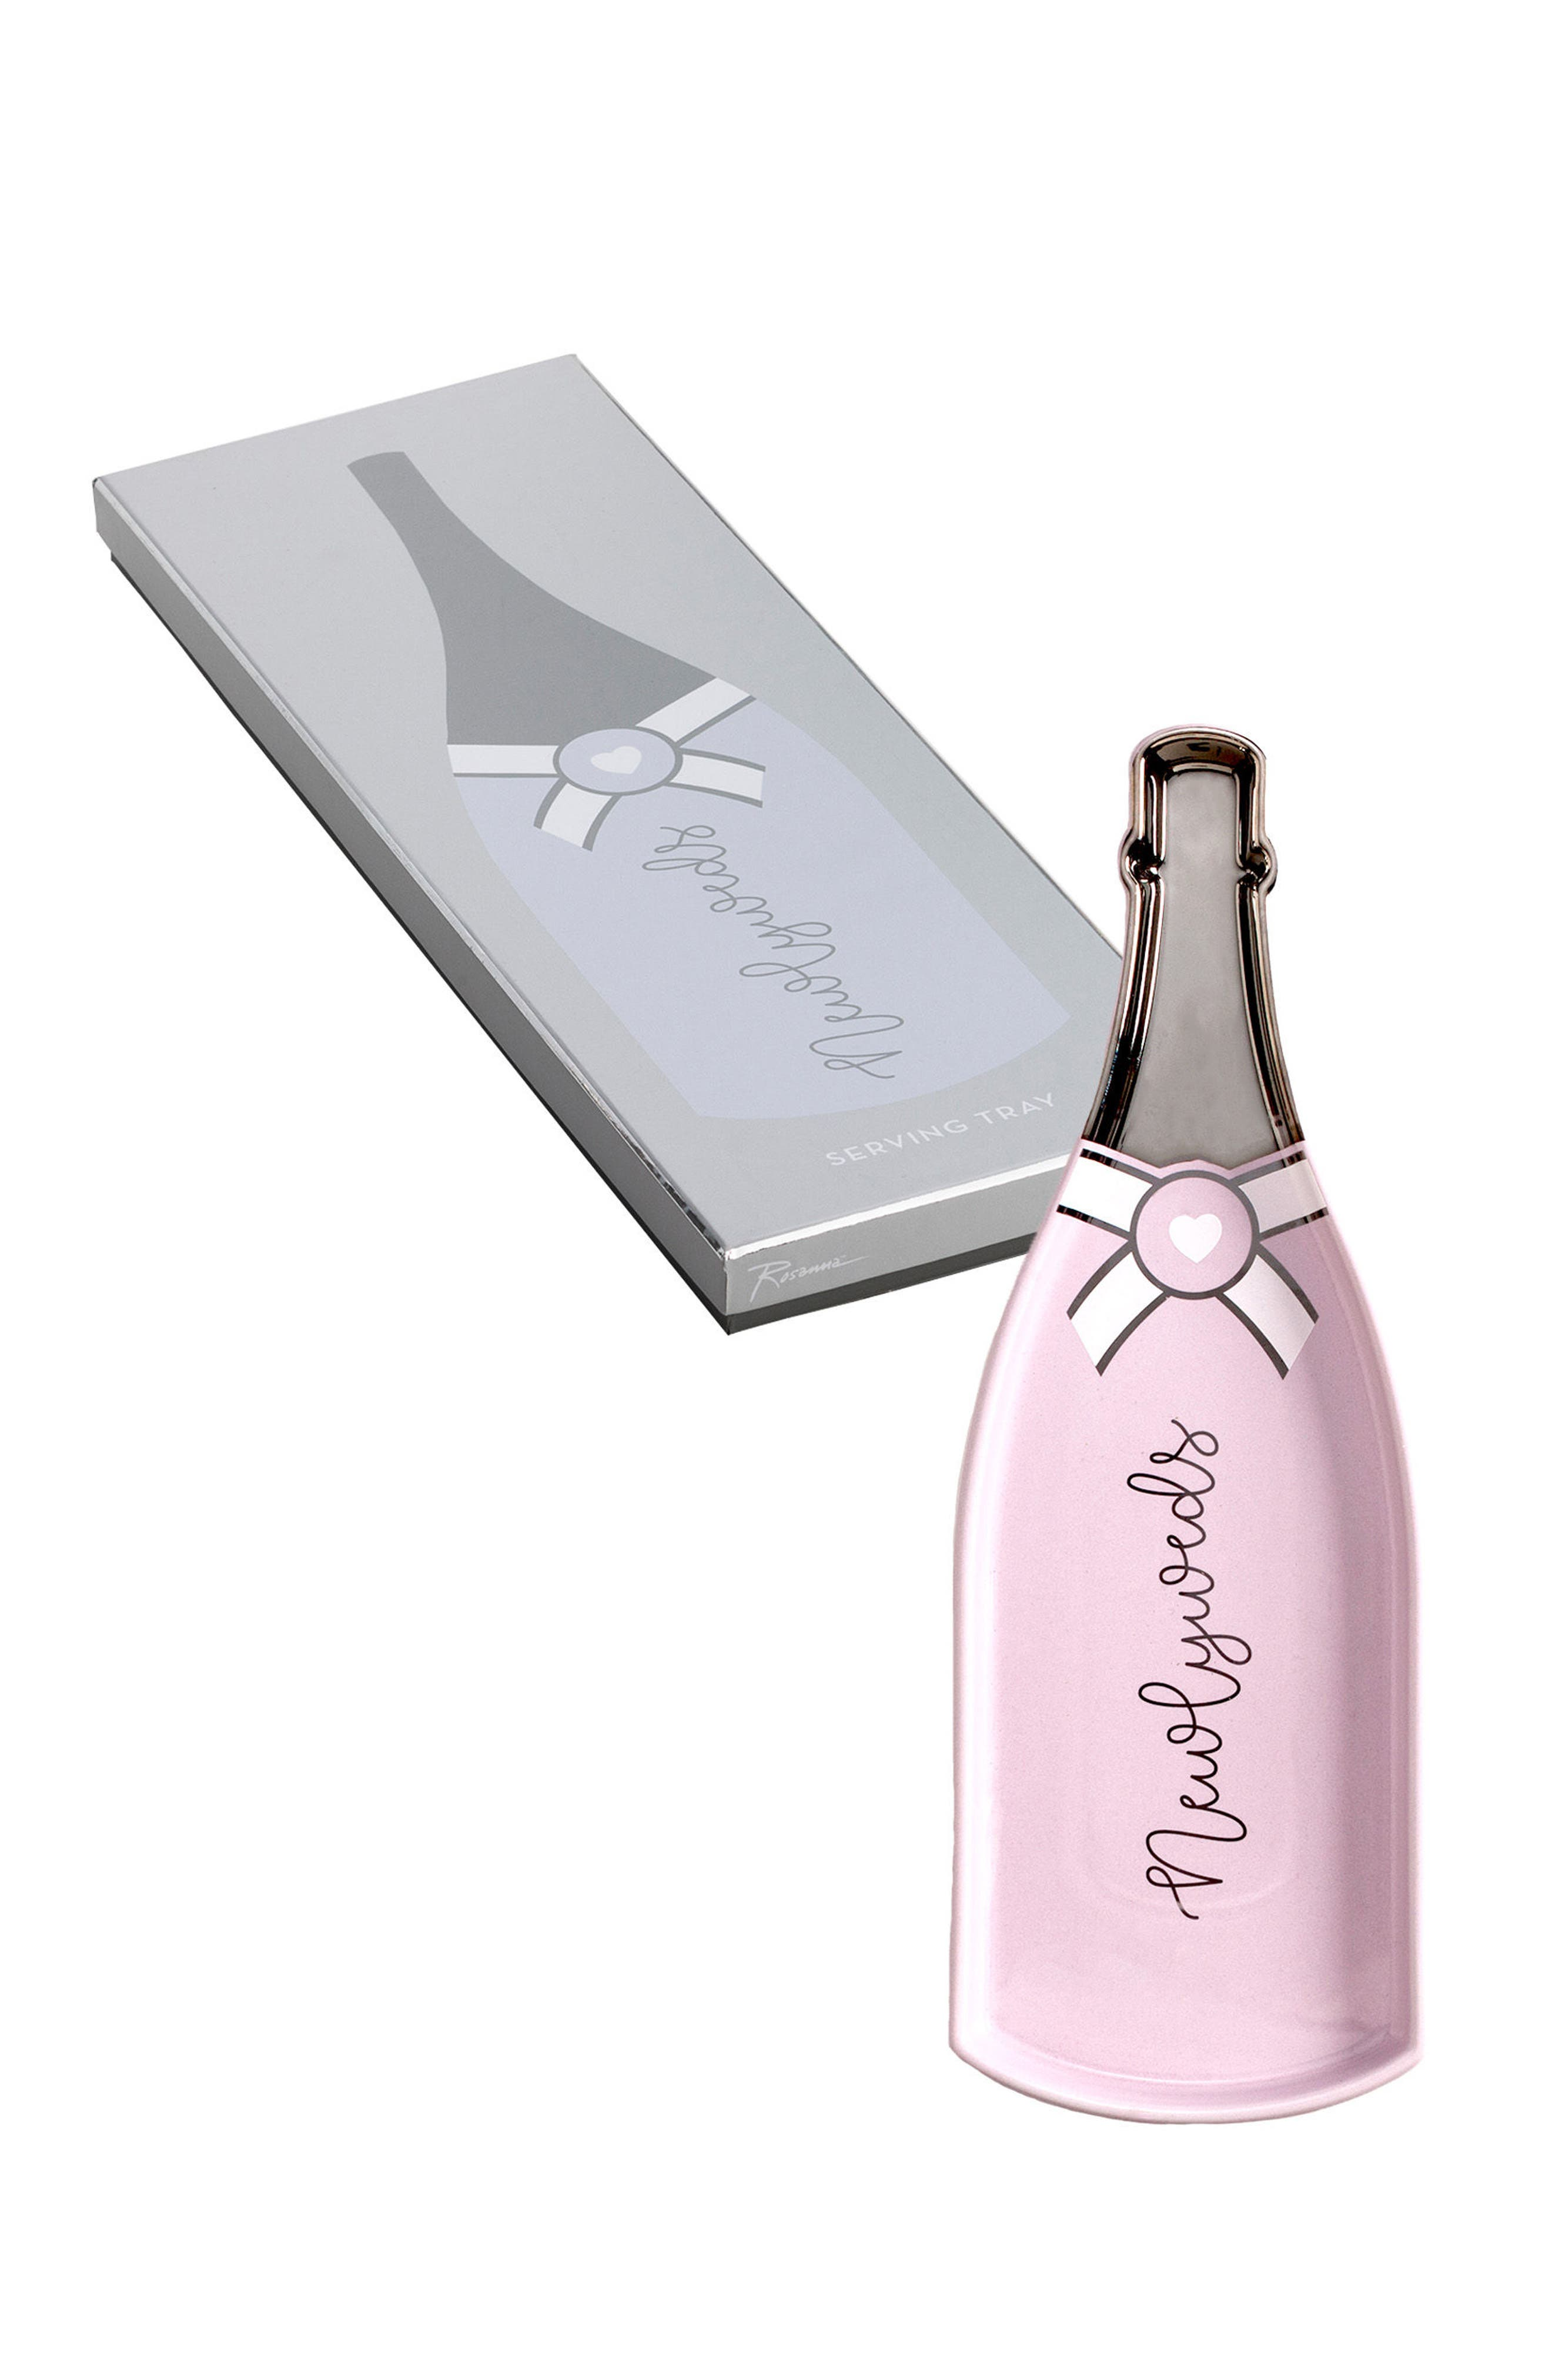 Newlyweds Champagne Bottle Tray,                             Main thumbnail 1, color,                             White Multi